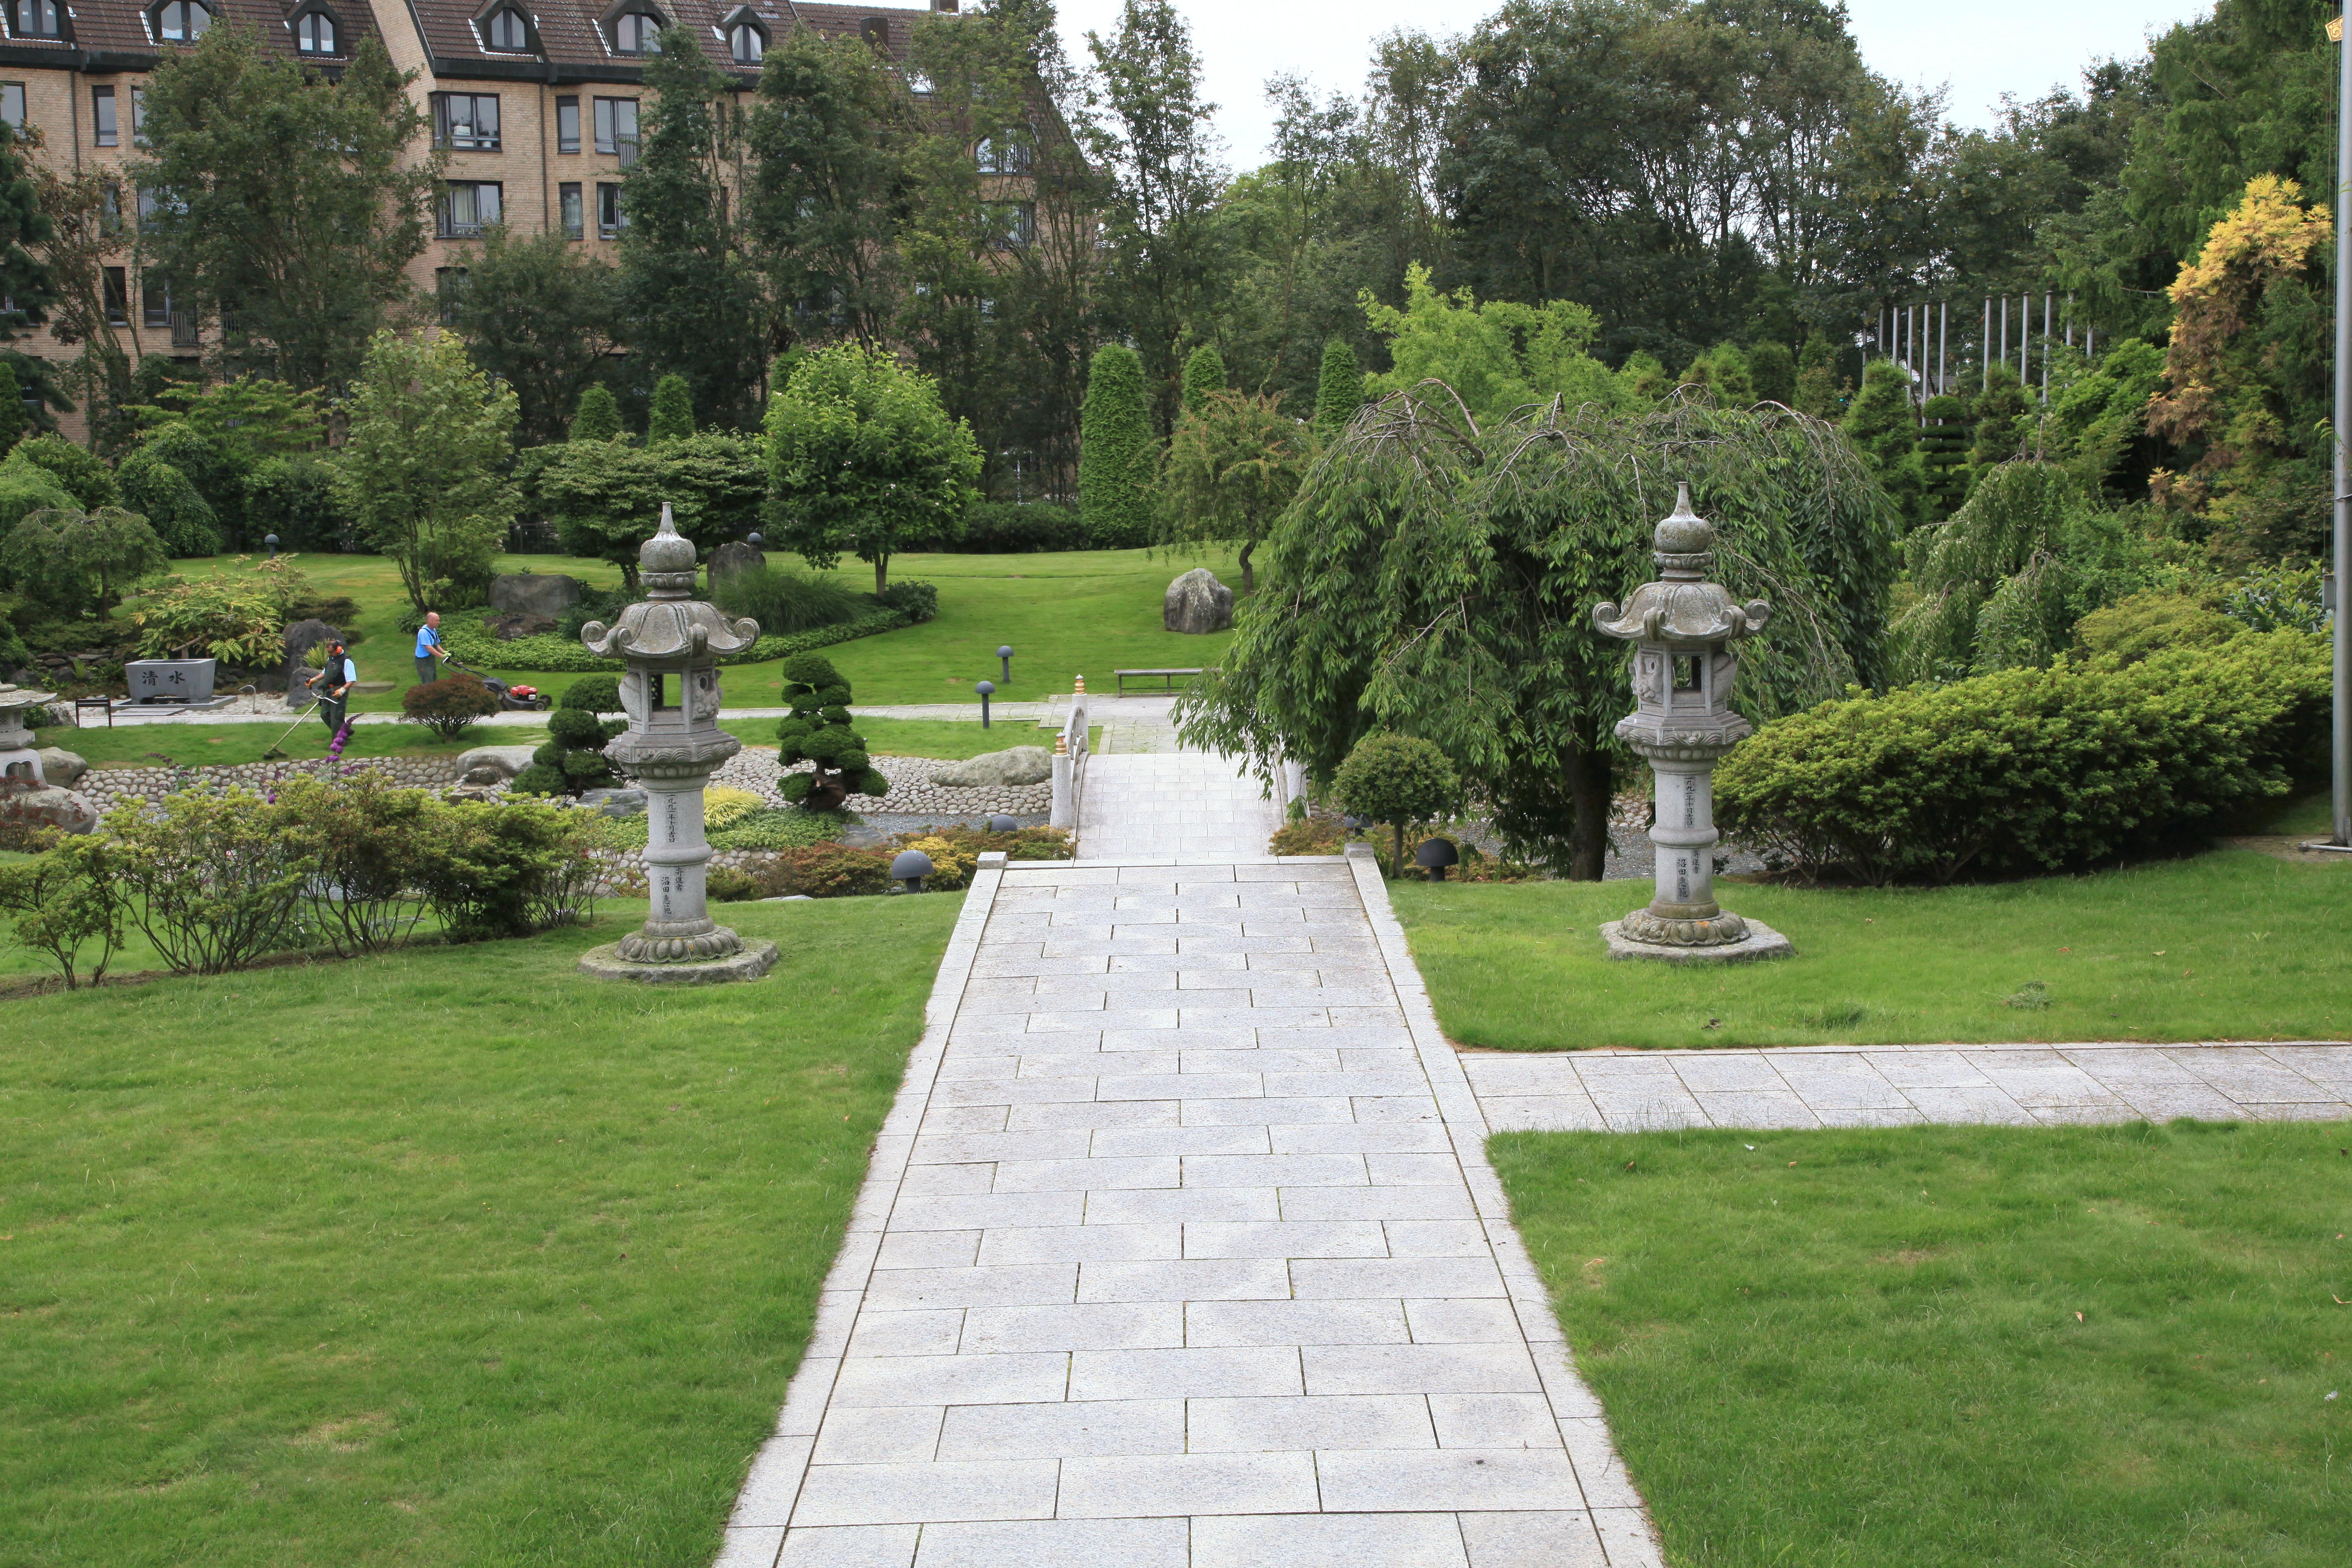 Filedüsseldorf Brüggener Weg Eko Haus Japanischer Garten 28